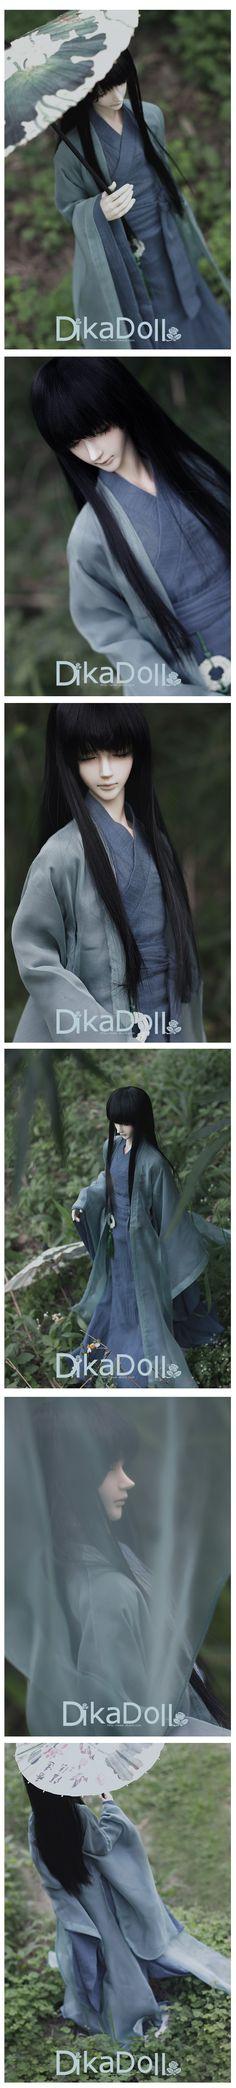 LiuZi, 73cm Dika Doll - BJD Dolls, Accessories - Alice's Collections